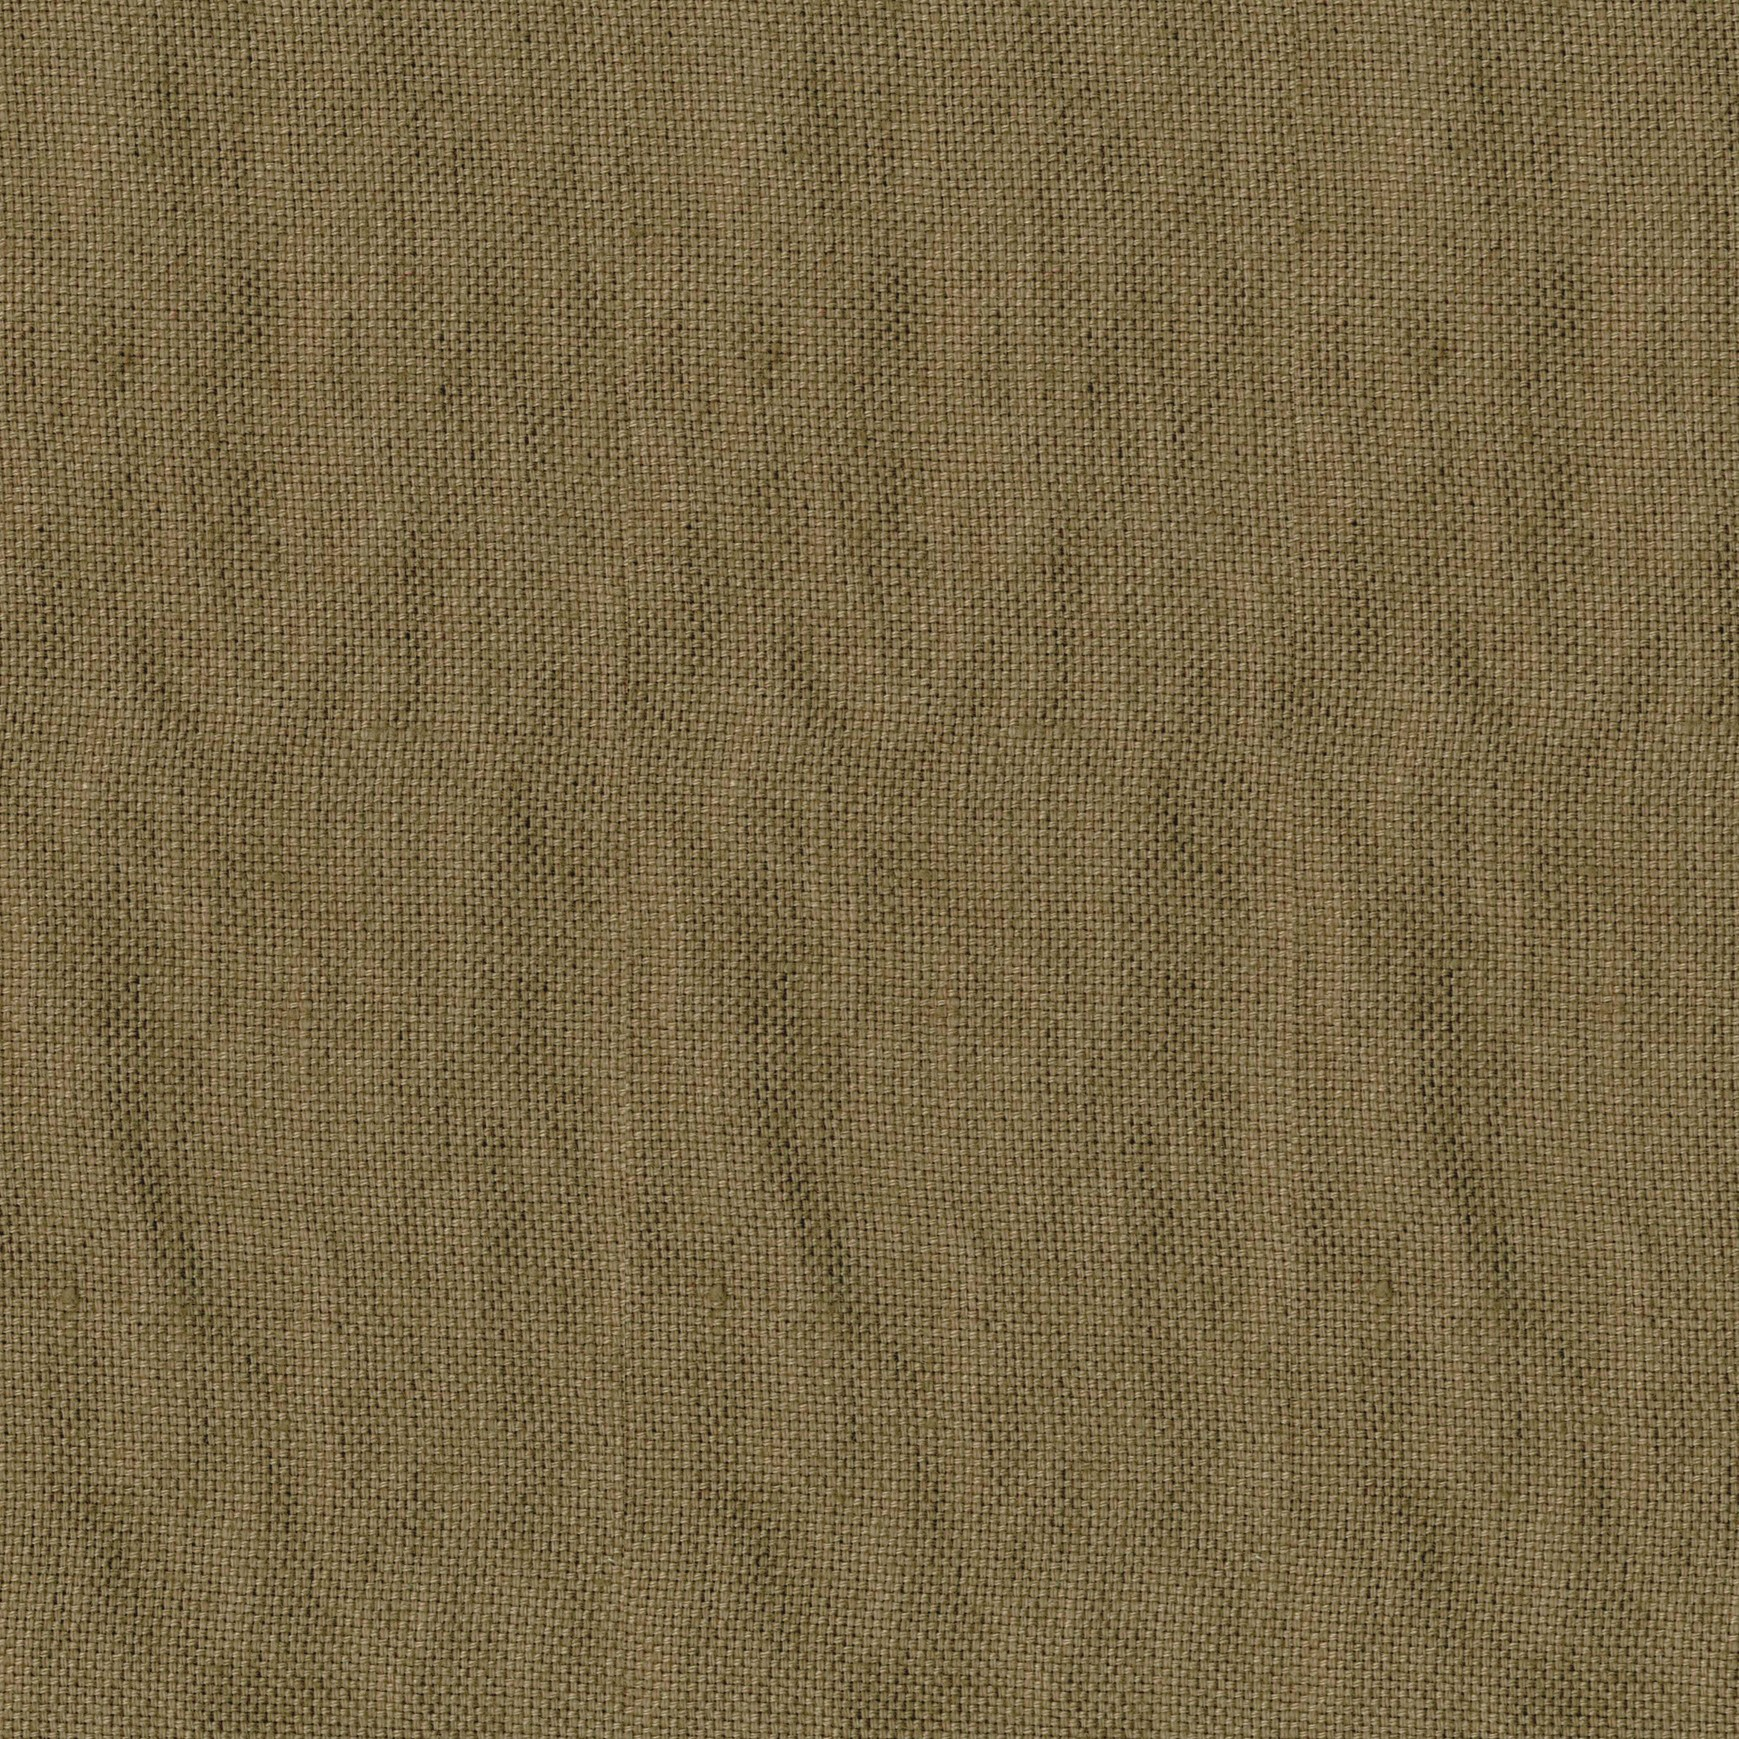 uni stoff aus leinen f r gardinen indy by equipo drt design cres mu oz. Black Bedroom Furniture Sets. Home Design Ideas